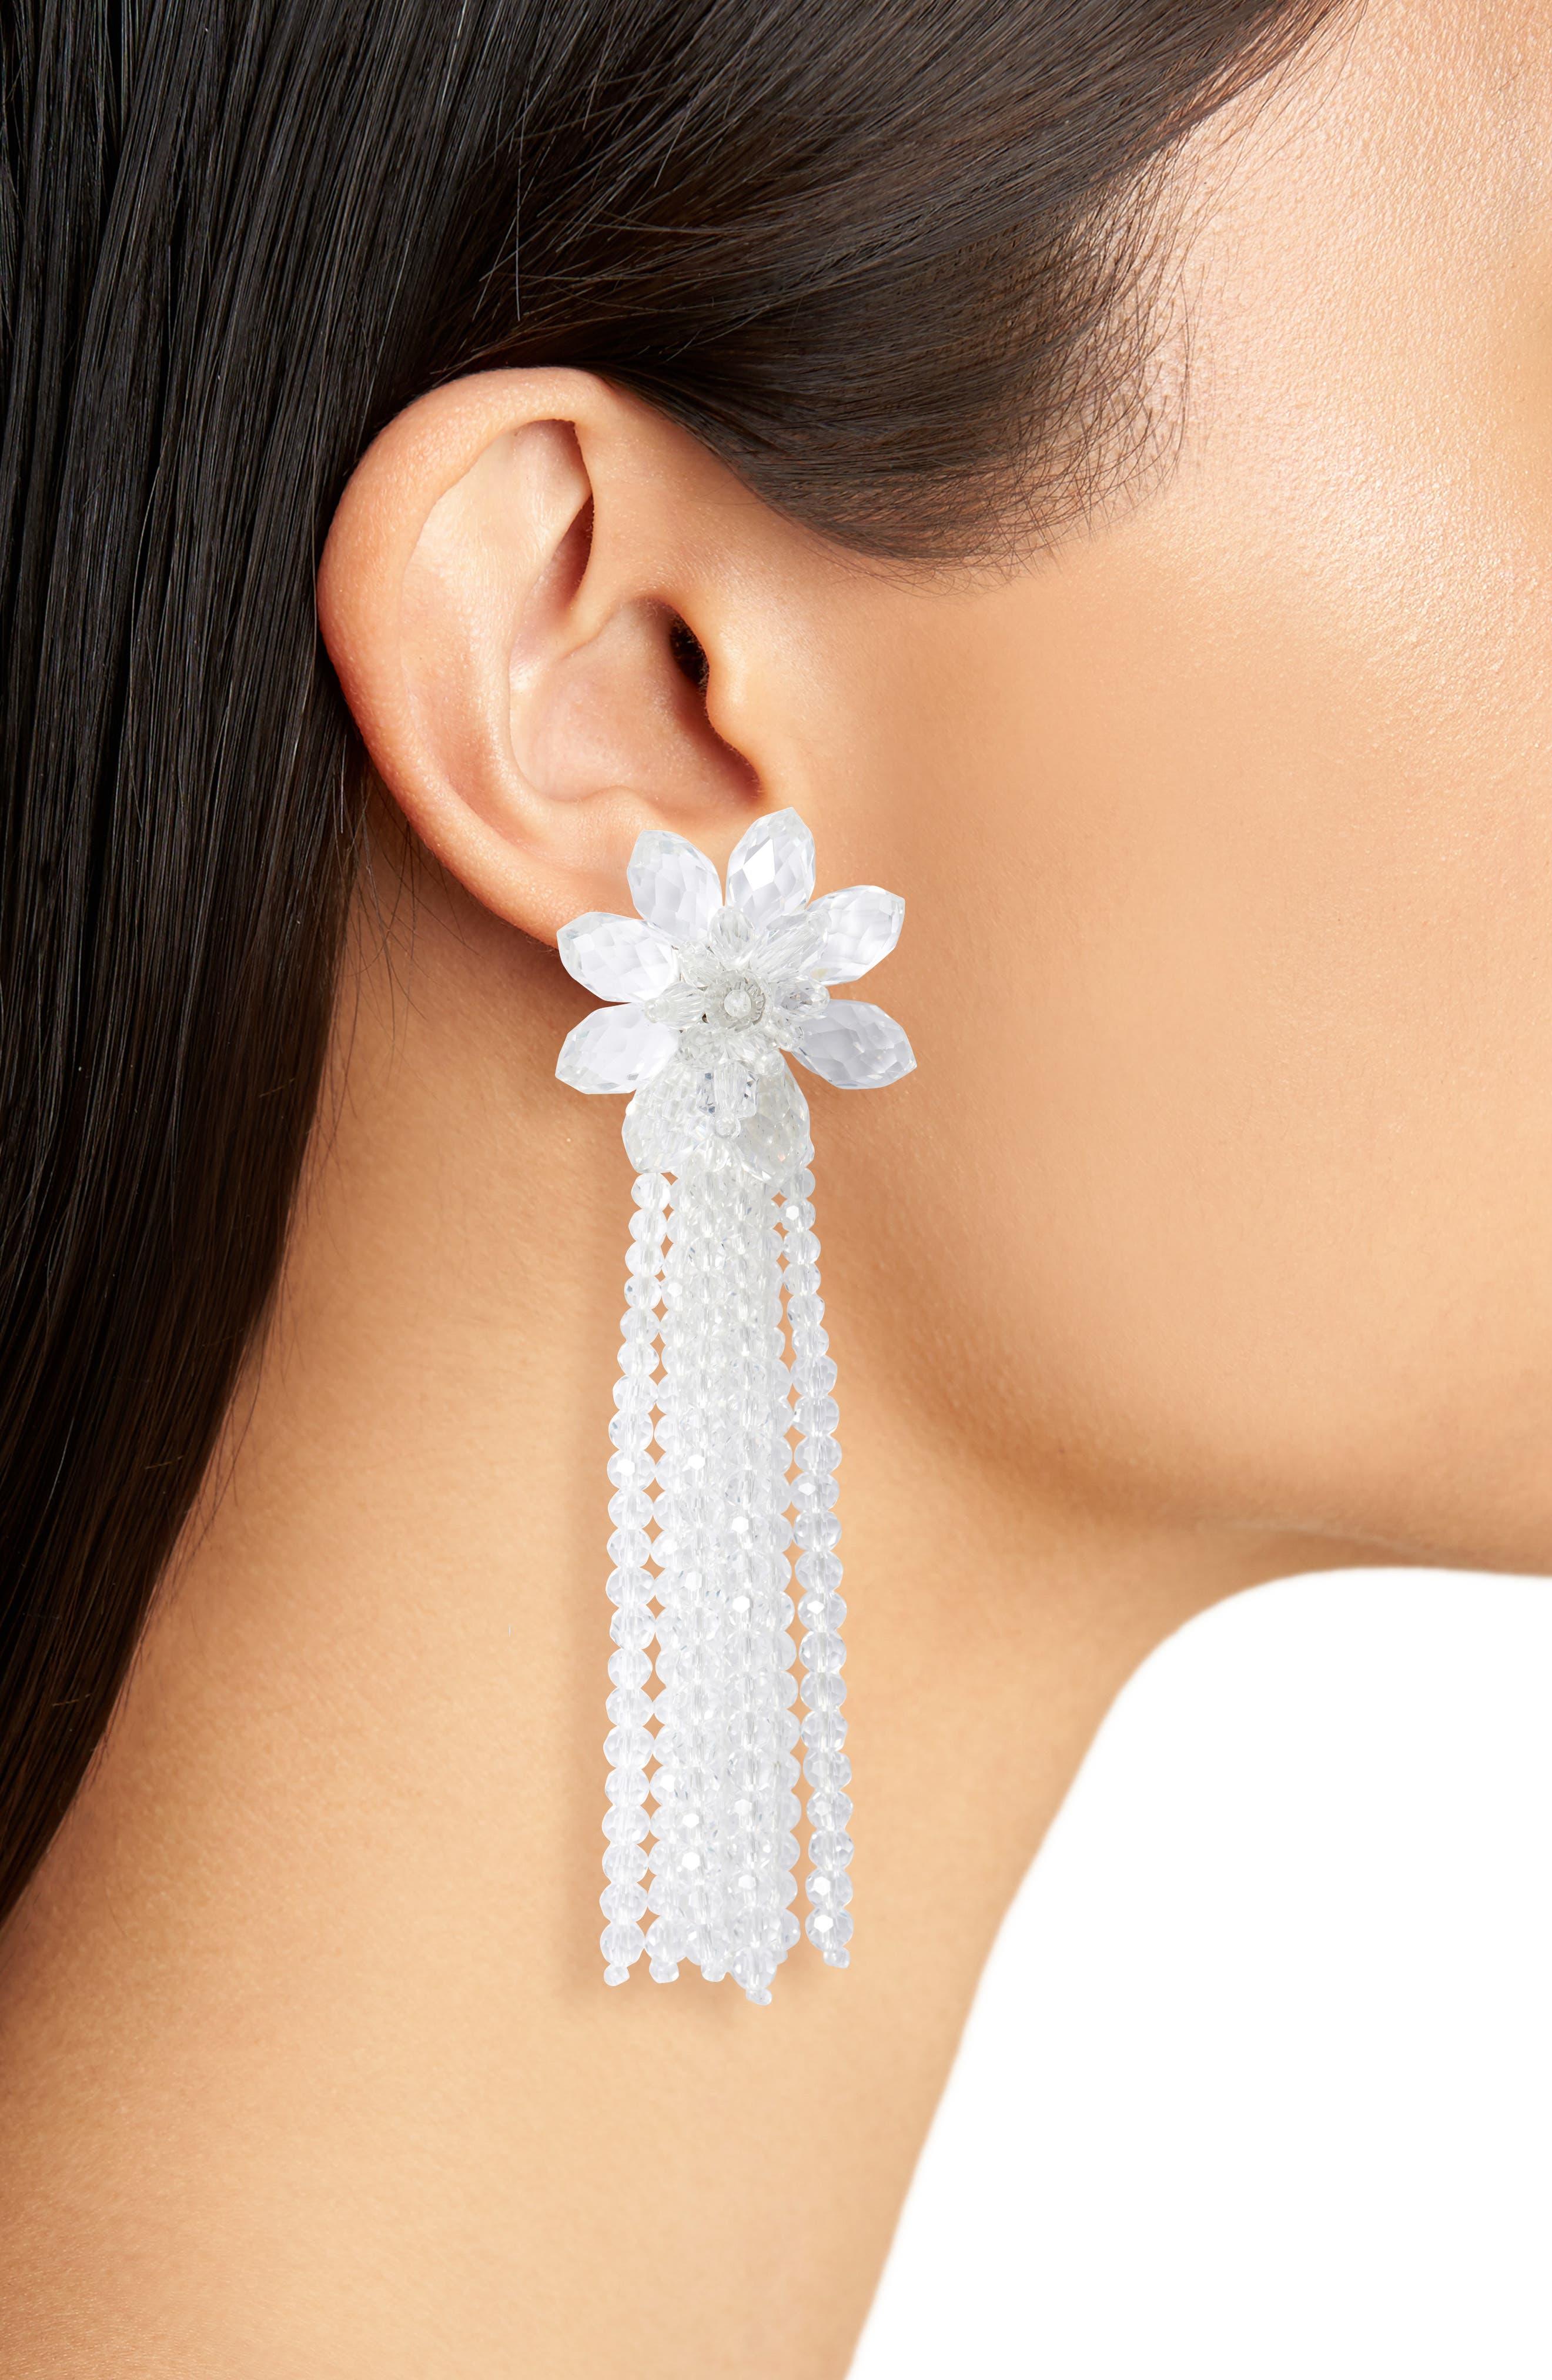 KATE SPADE NEW YORK,                             statement crystal tassel drop earrings,                             Alternate thumbnail 2, color,                             CLEAR